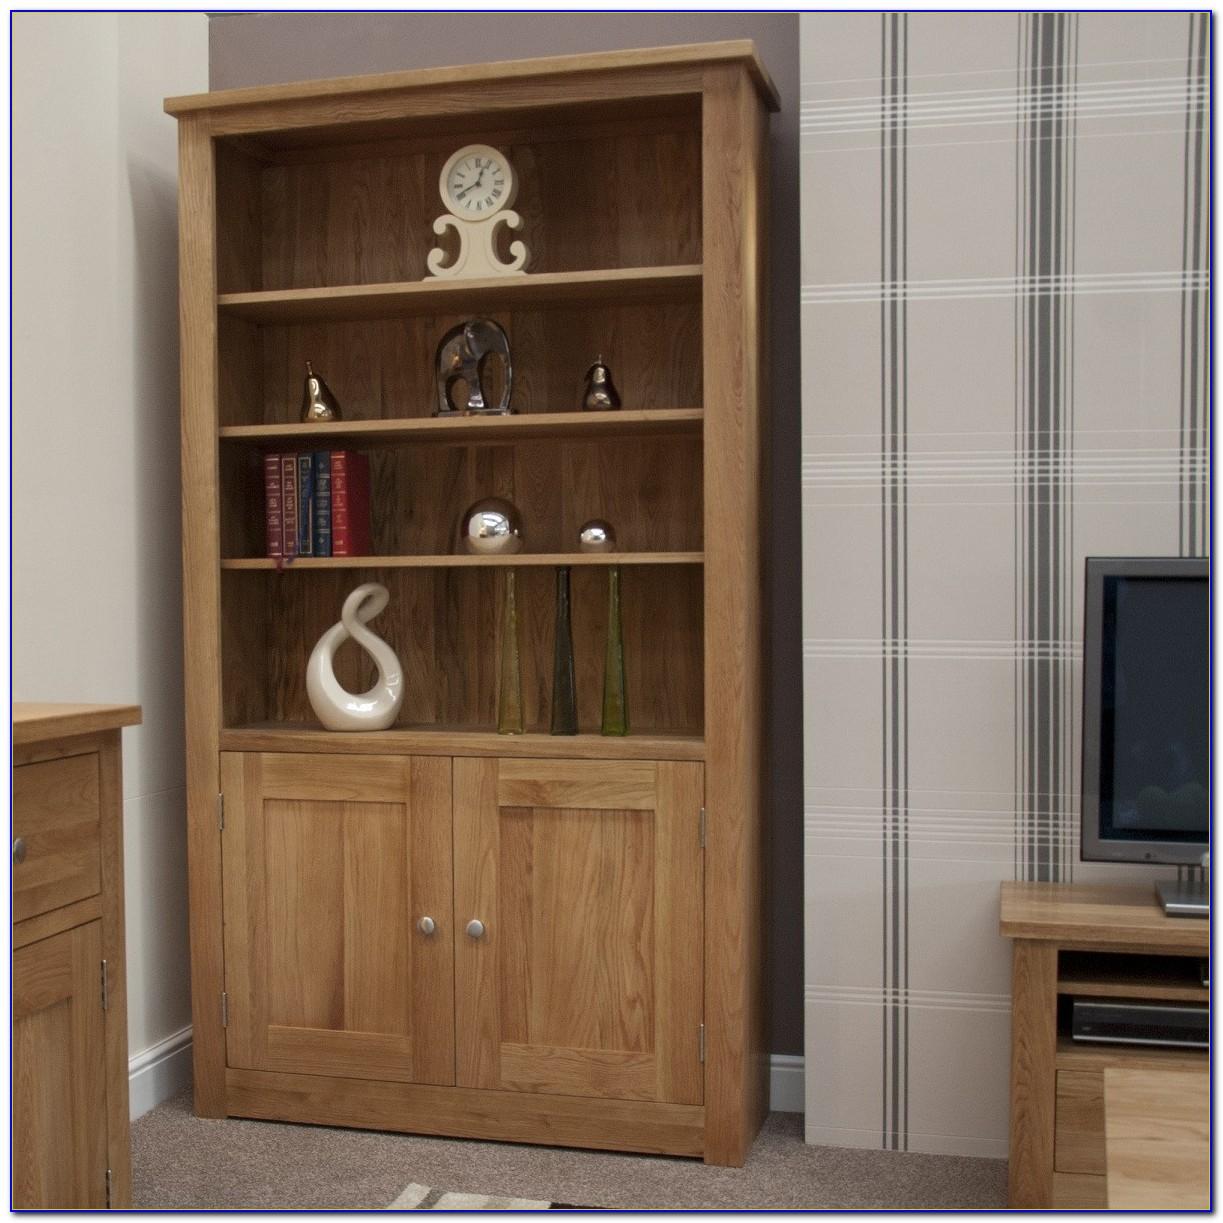 Oak Bookshelf With Doors